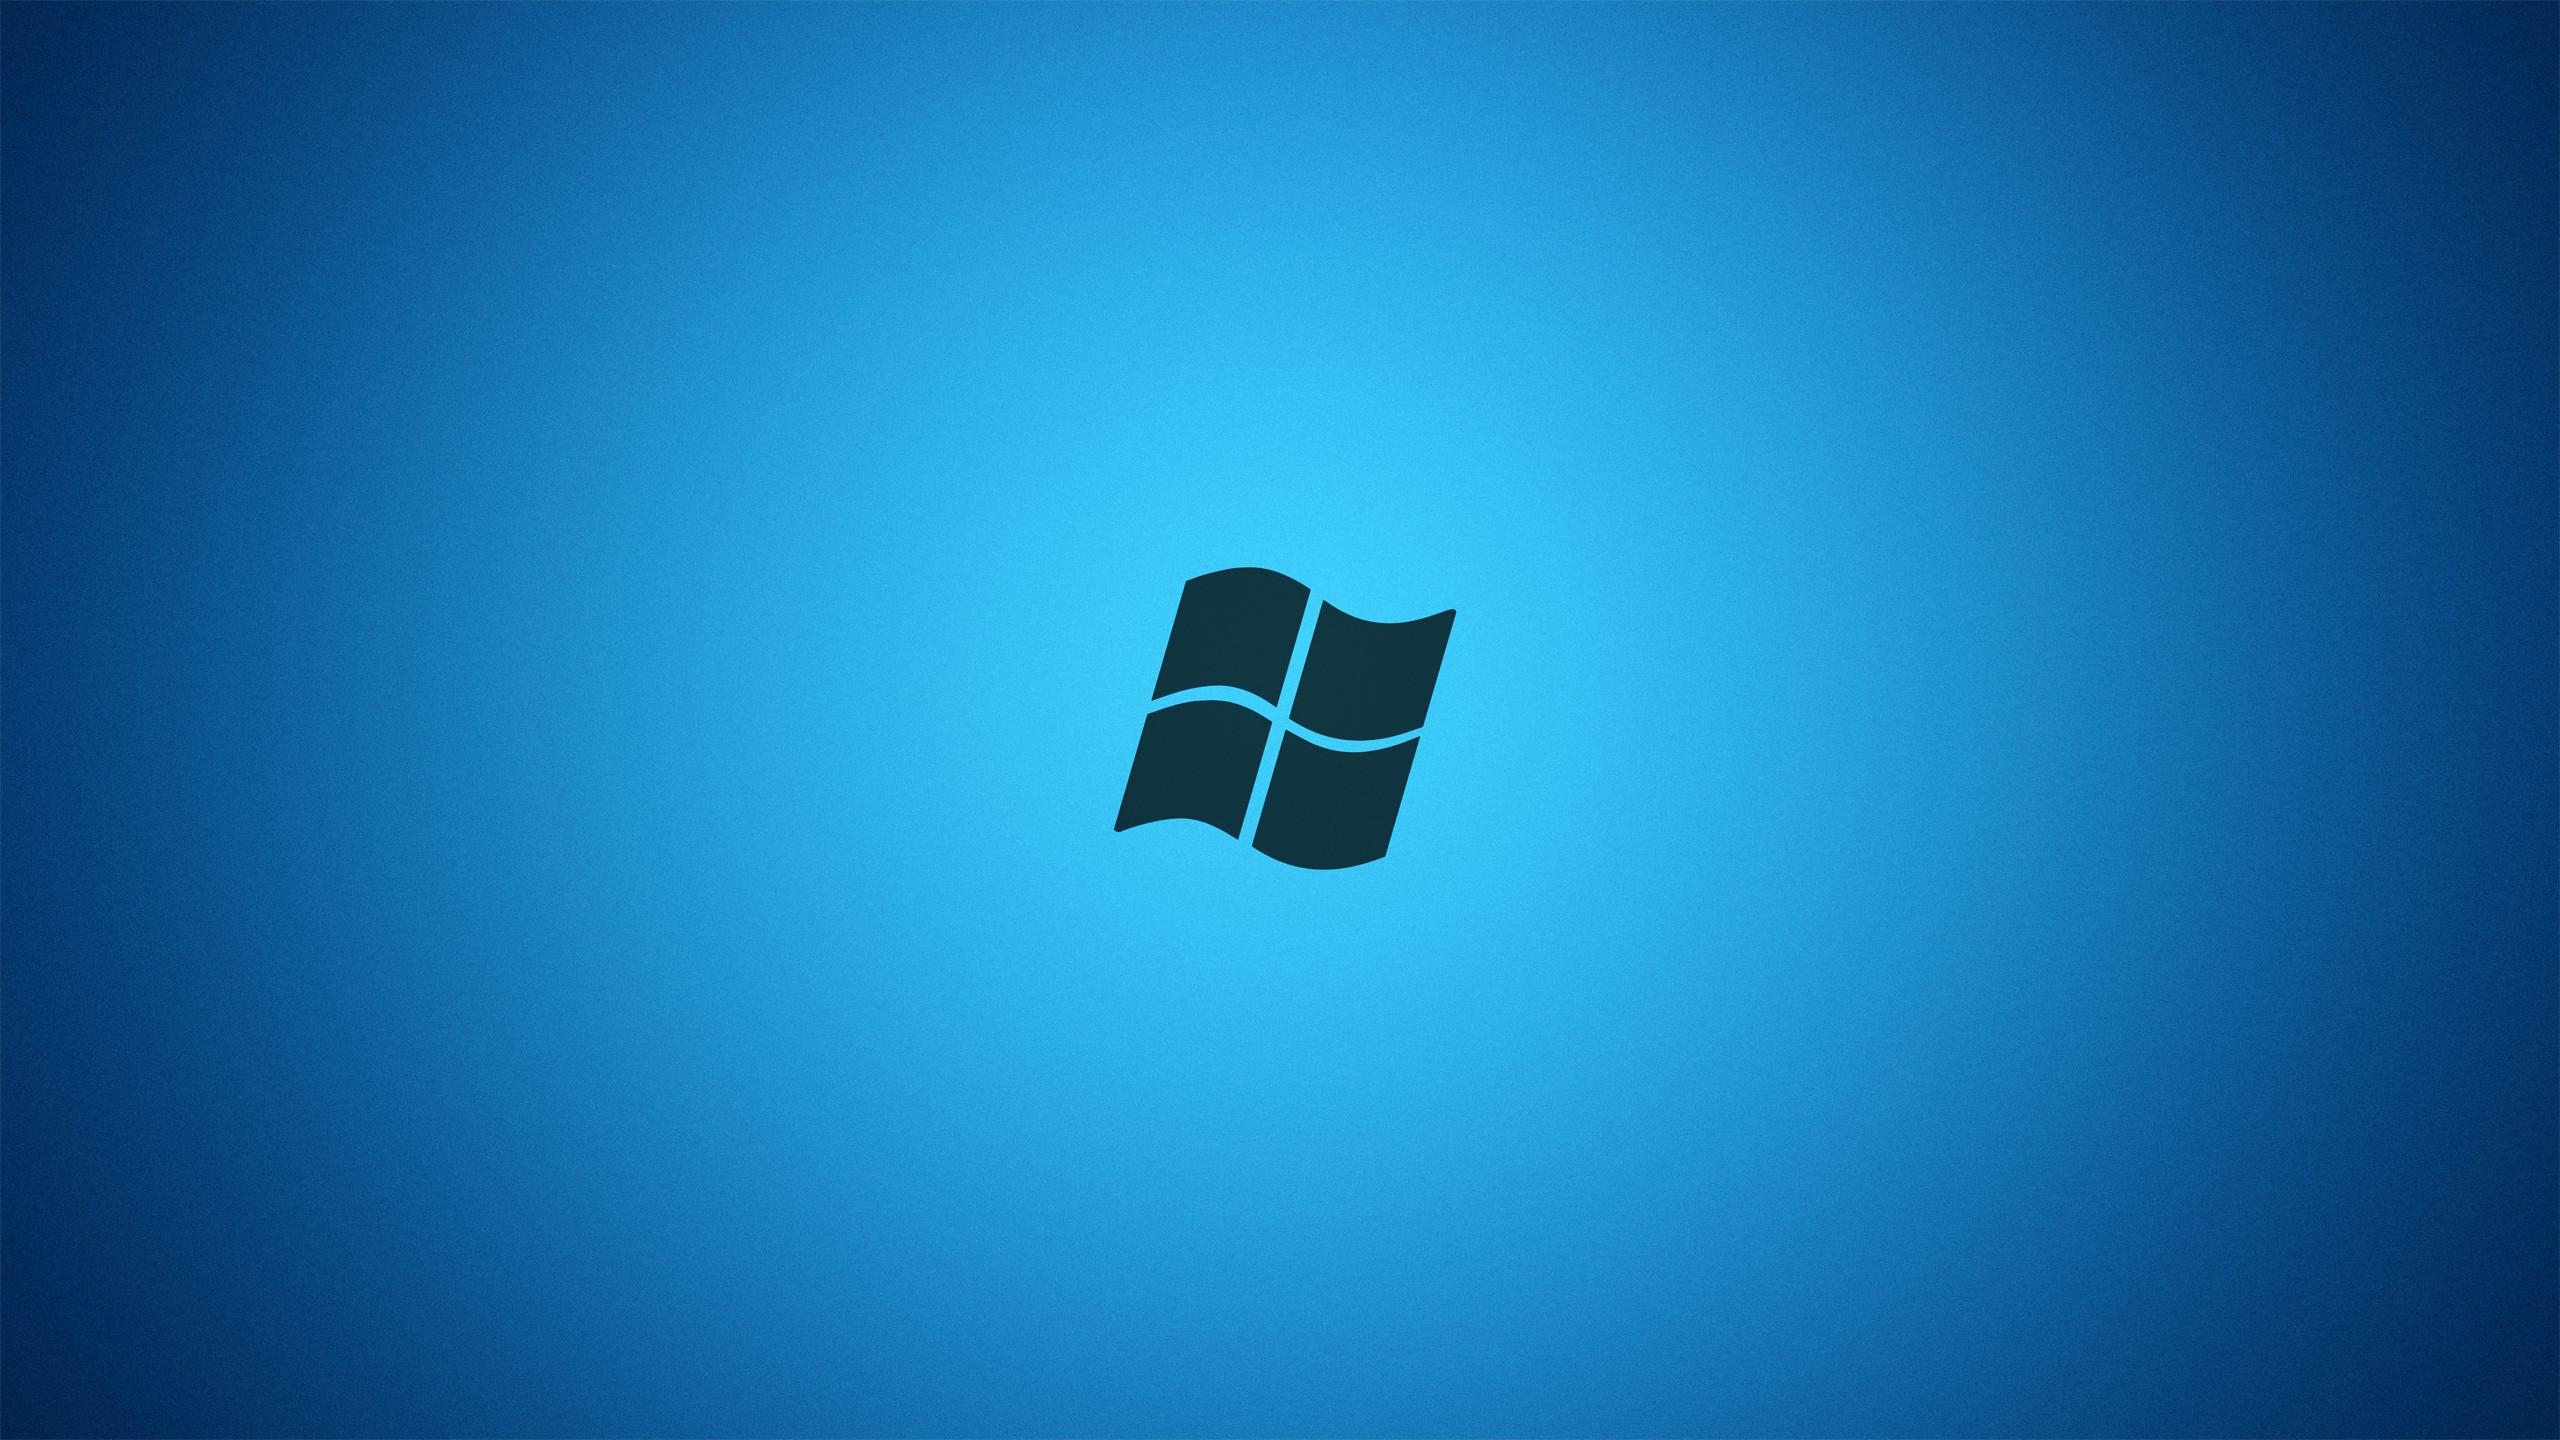 Background Windows 2560x1440